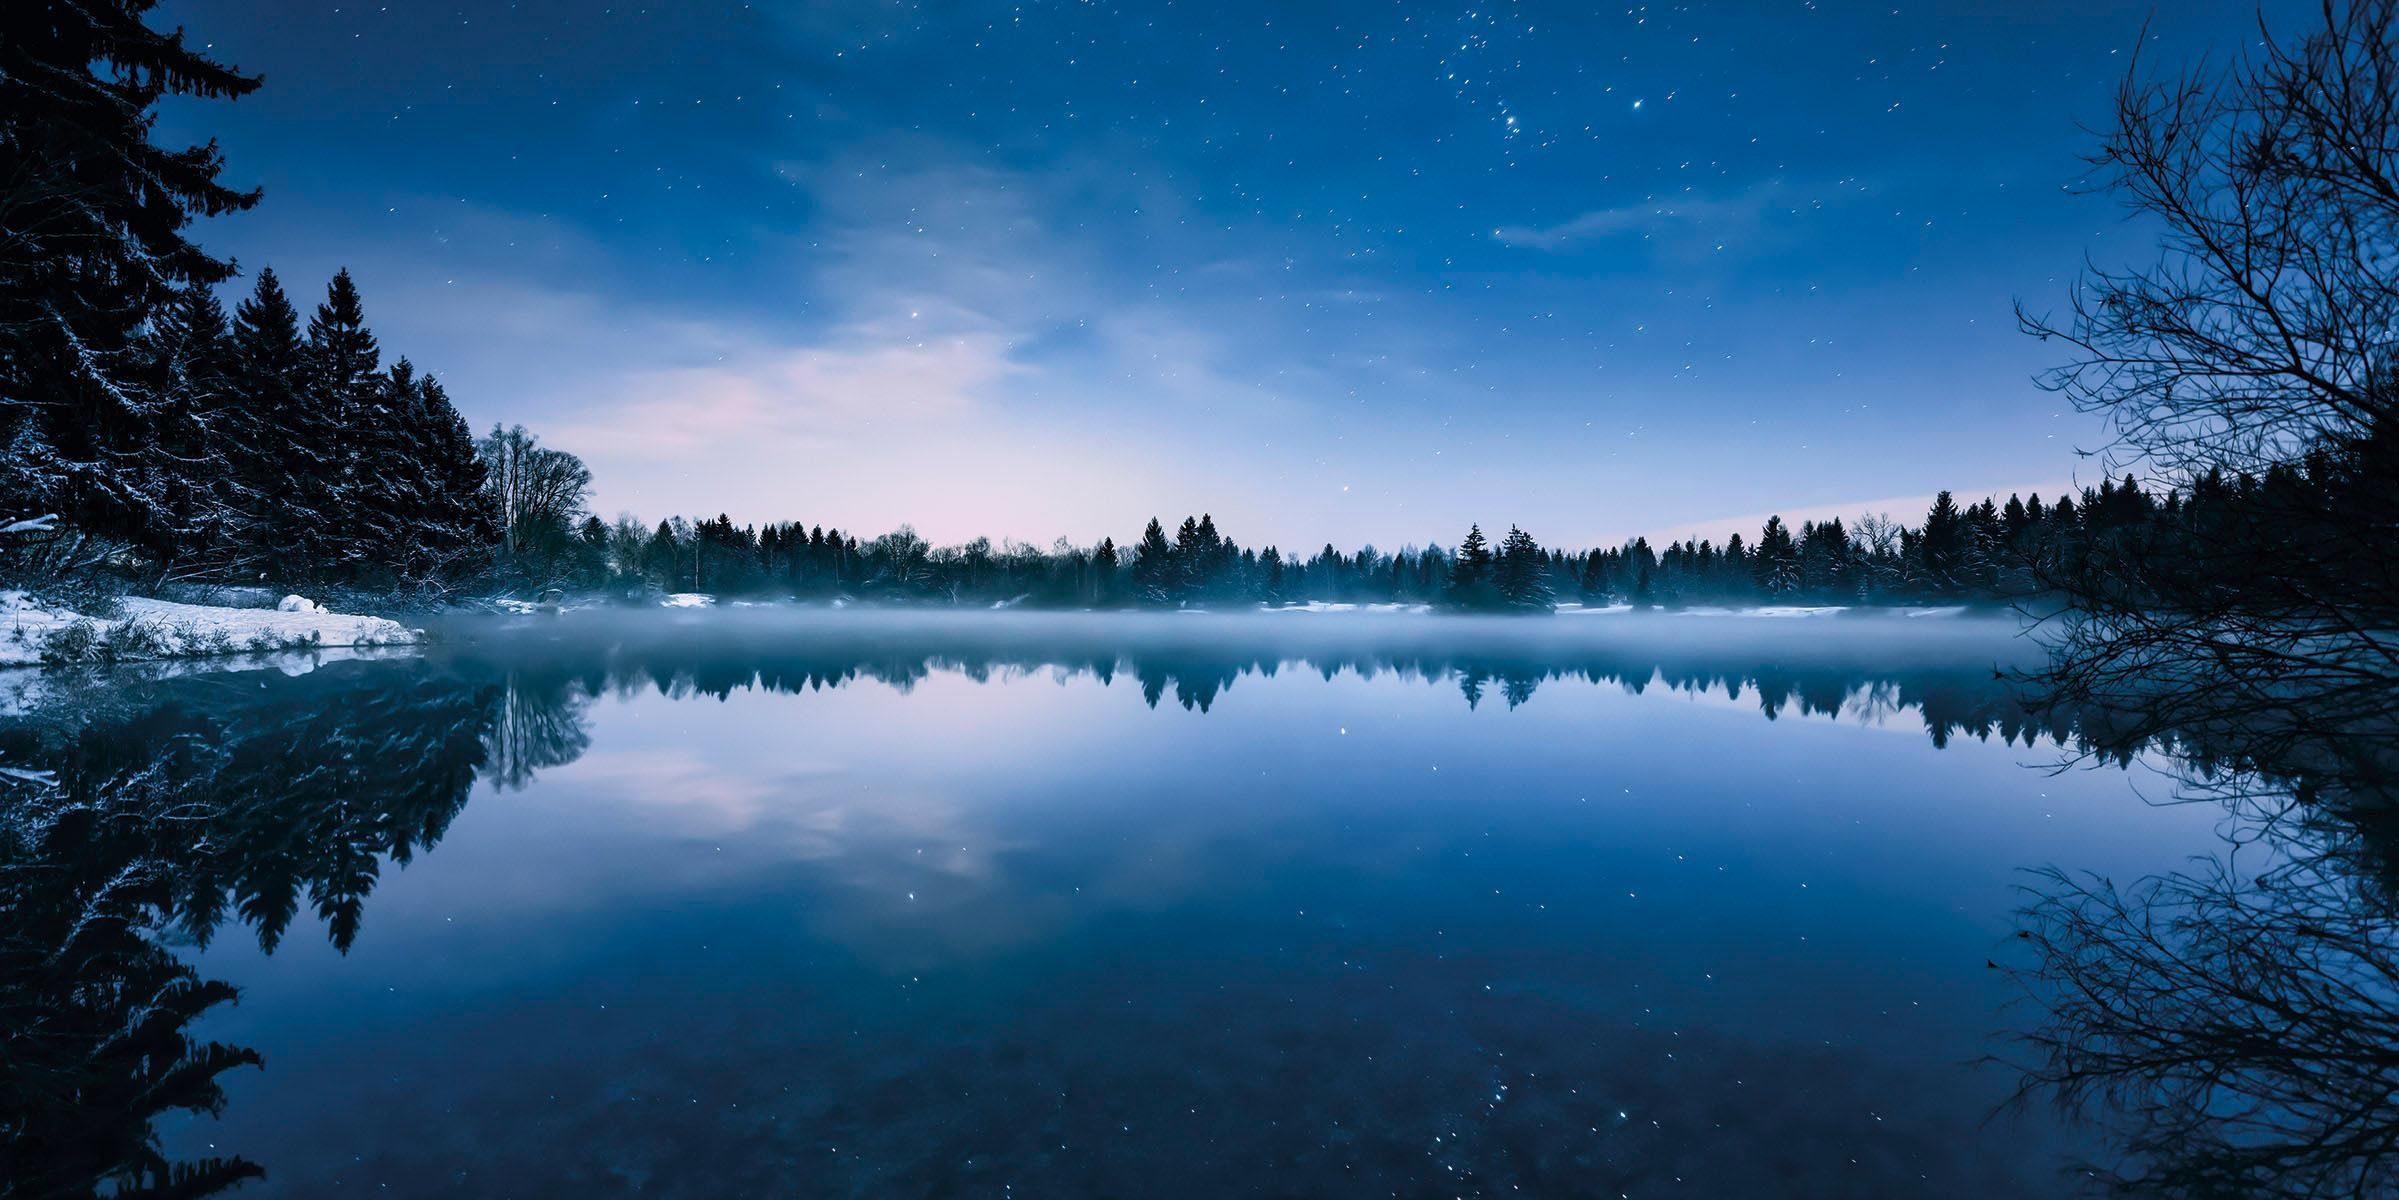 Komar Vlies Fototapete »Glistening stars« 200/100 cm